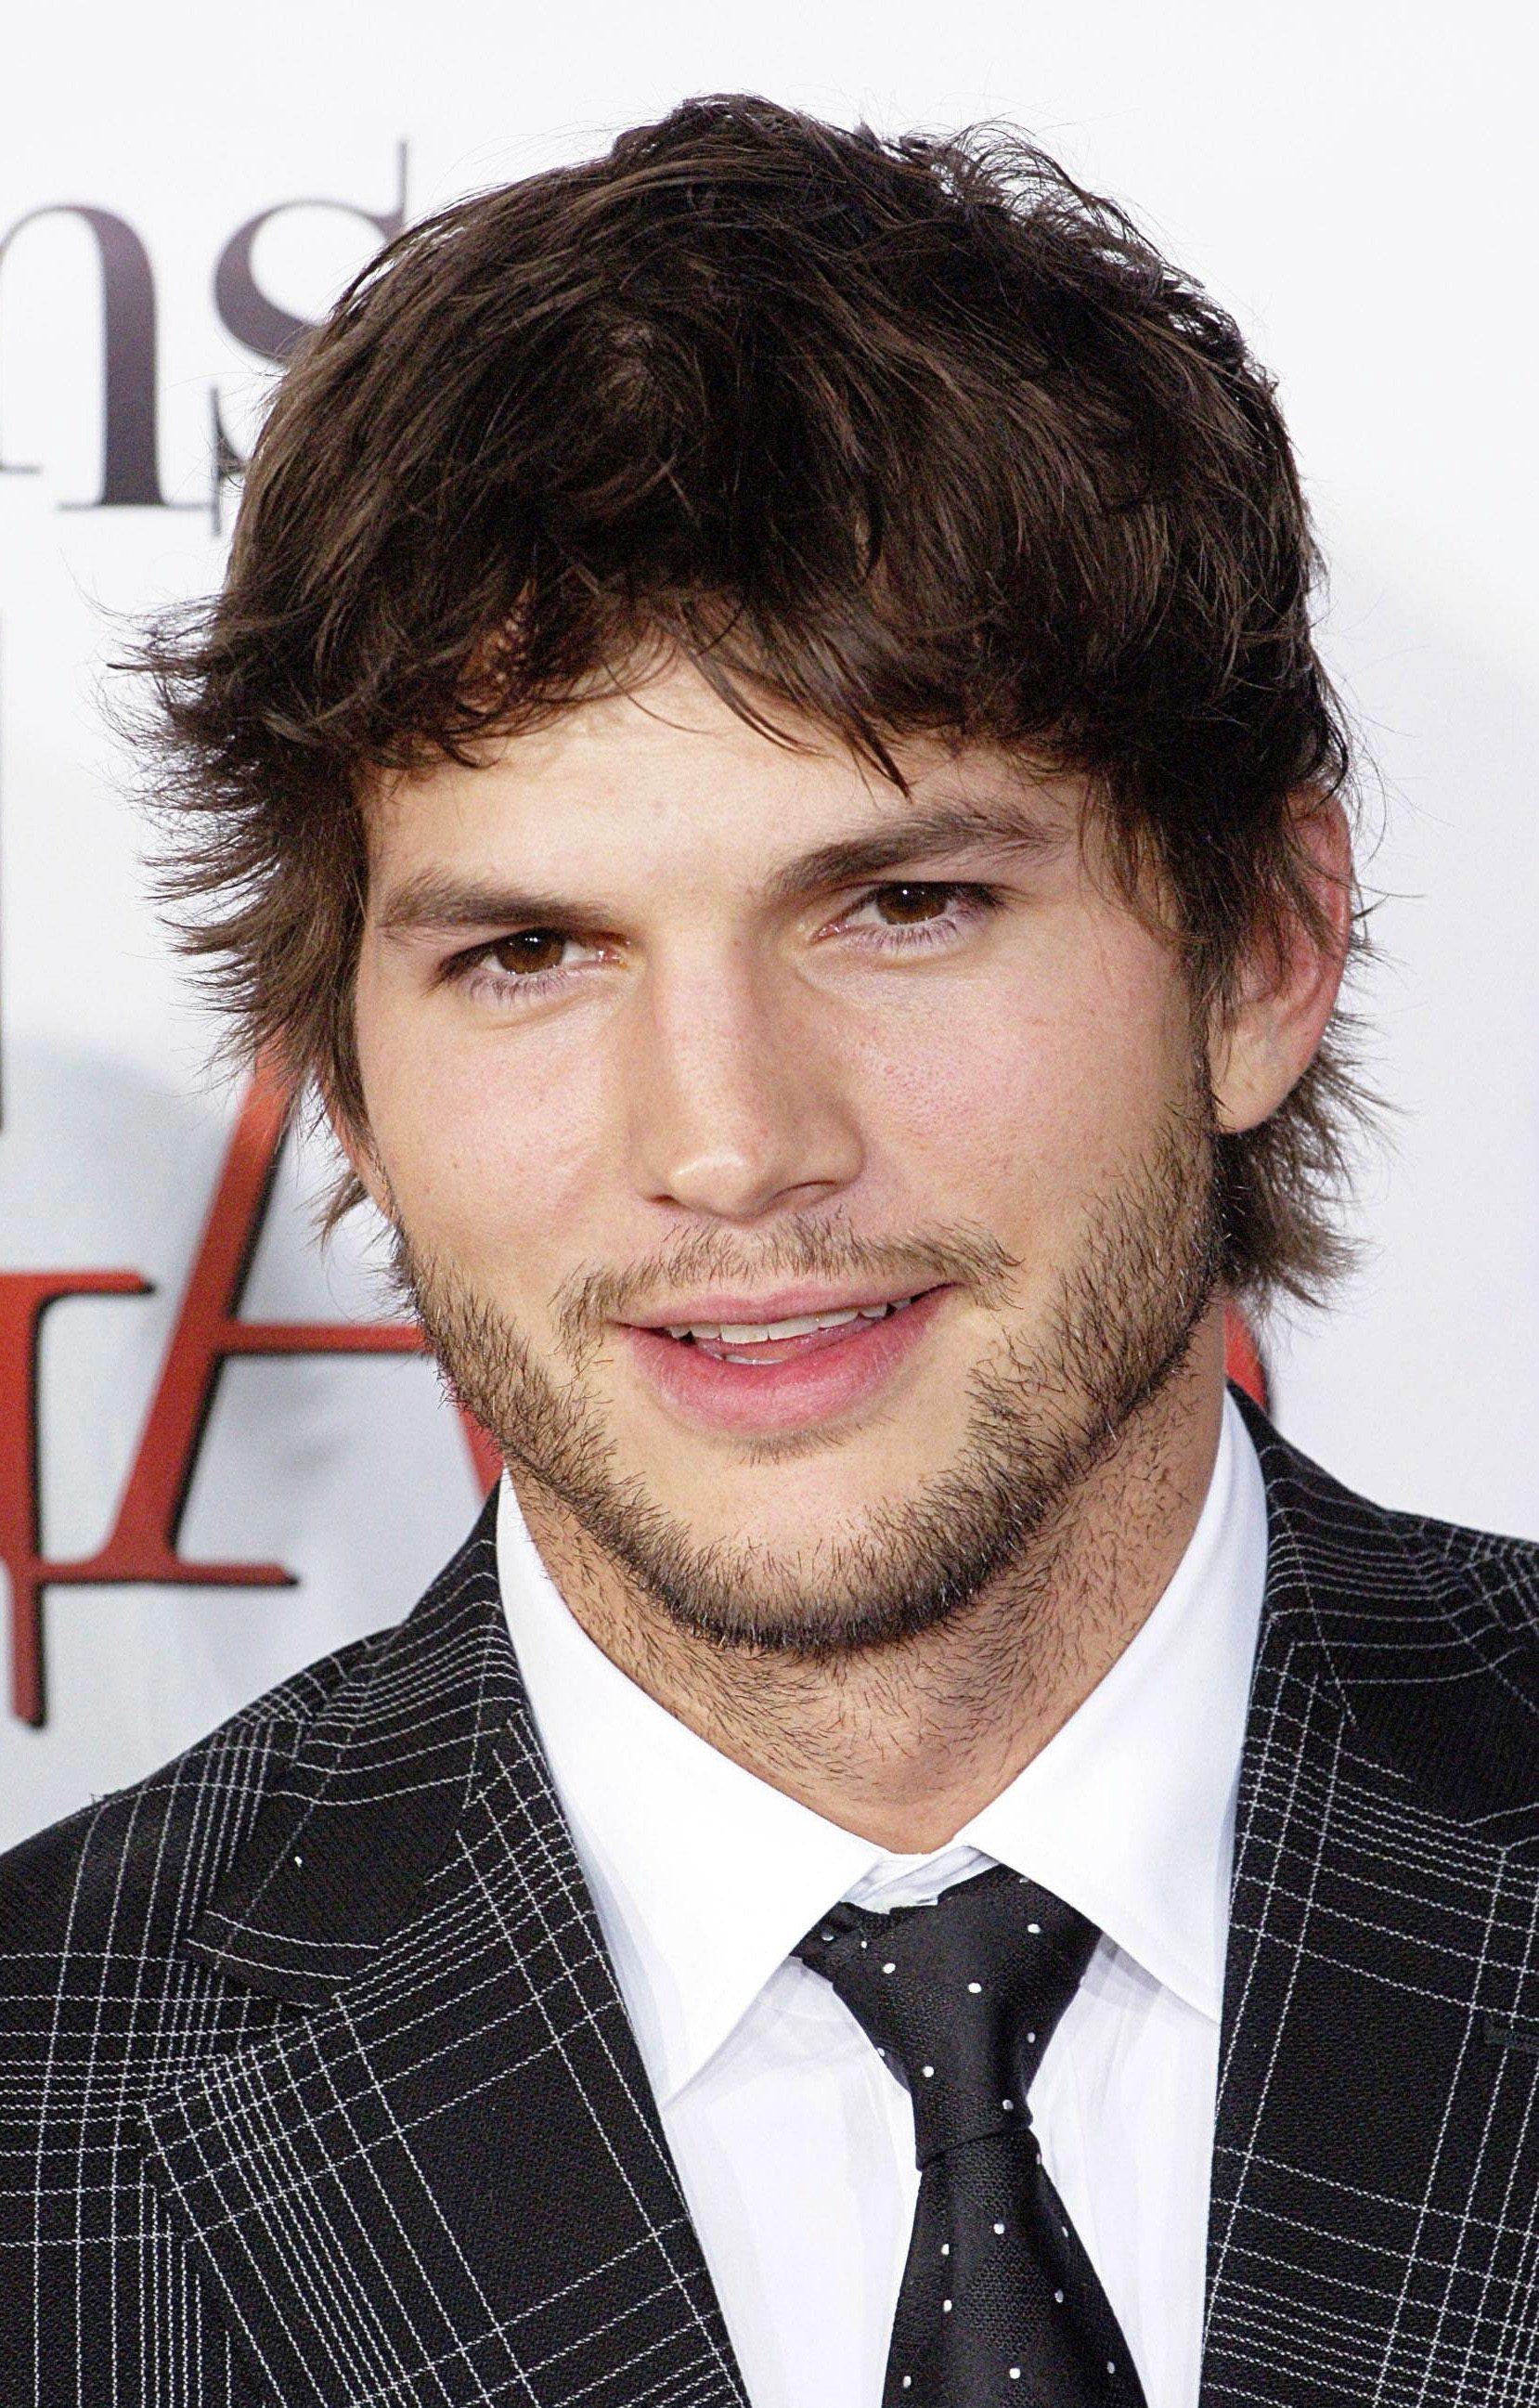 Ashton Kutcher's Short Wings Haircut